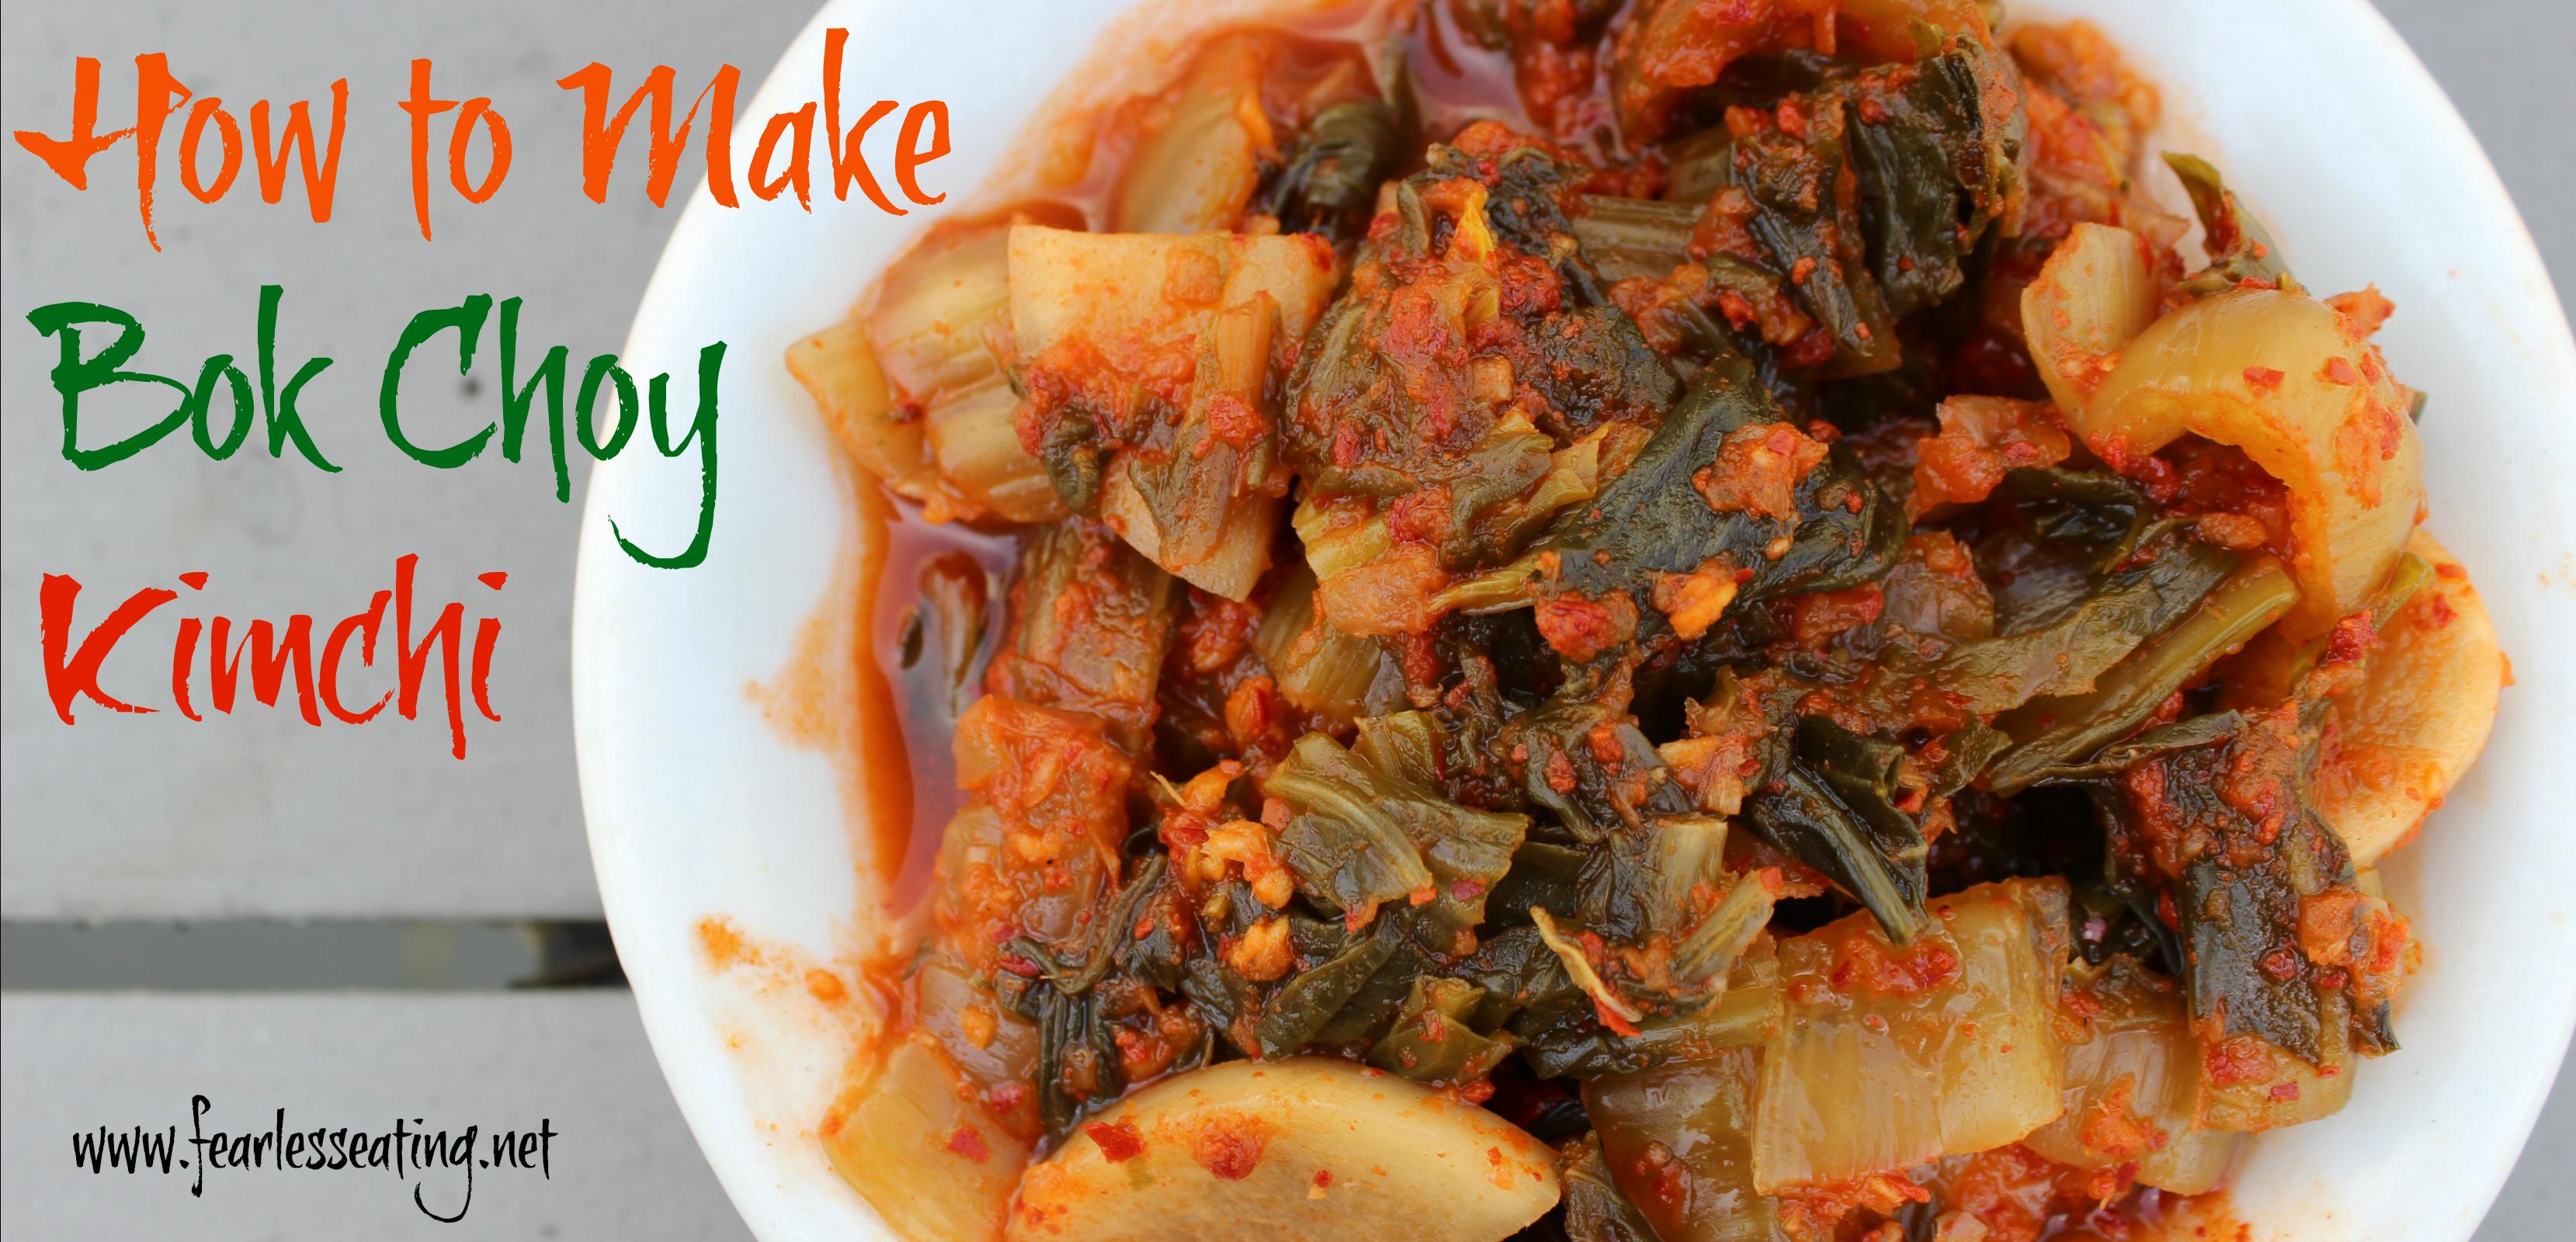 How to Make Bok Choy Kimchi